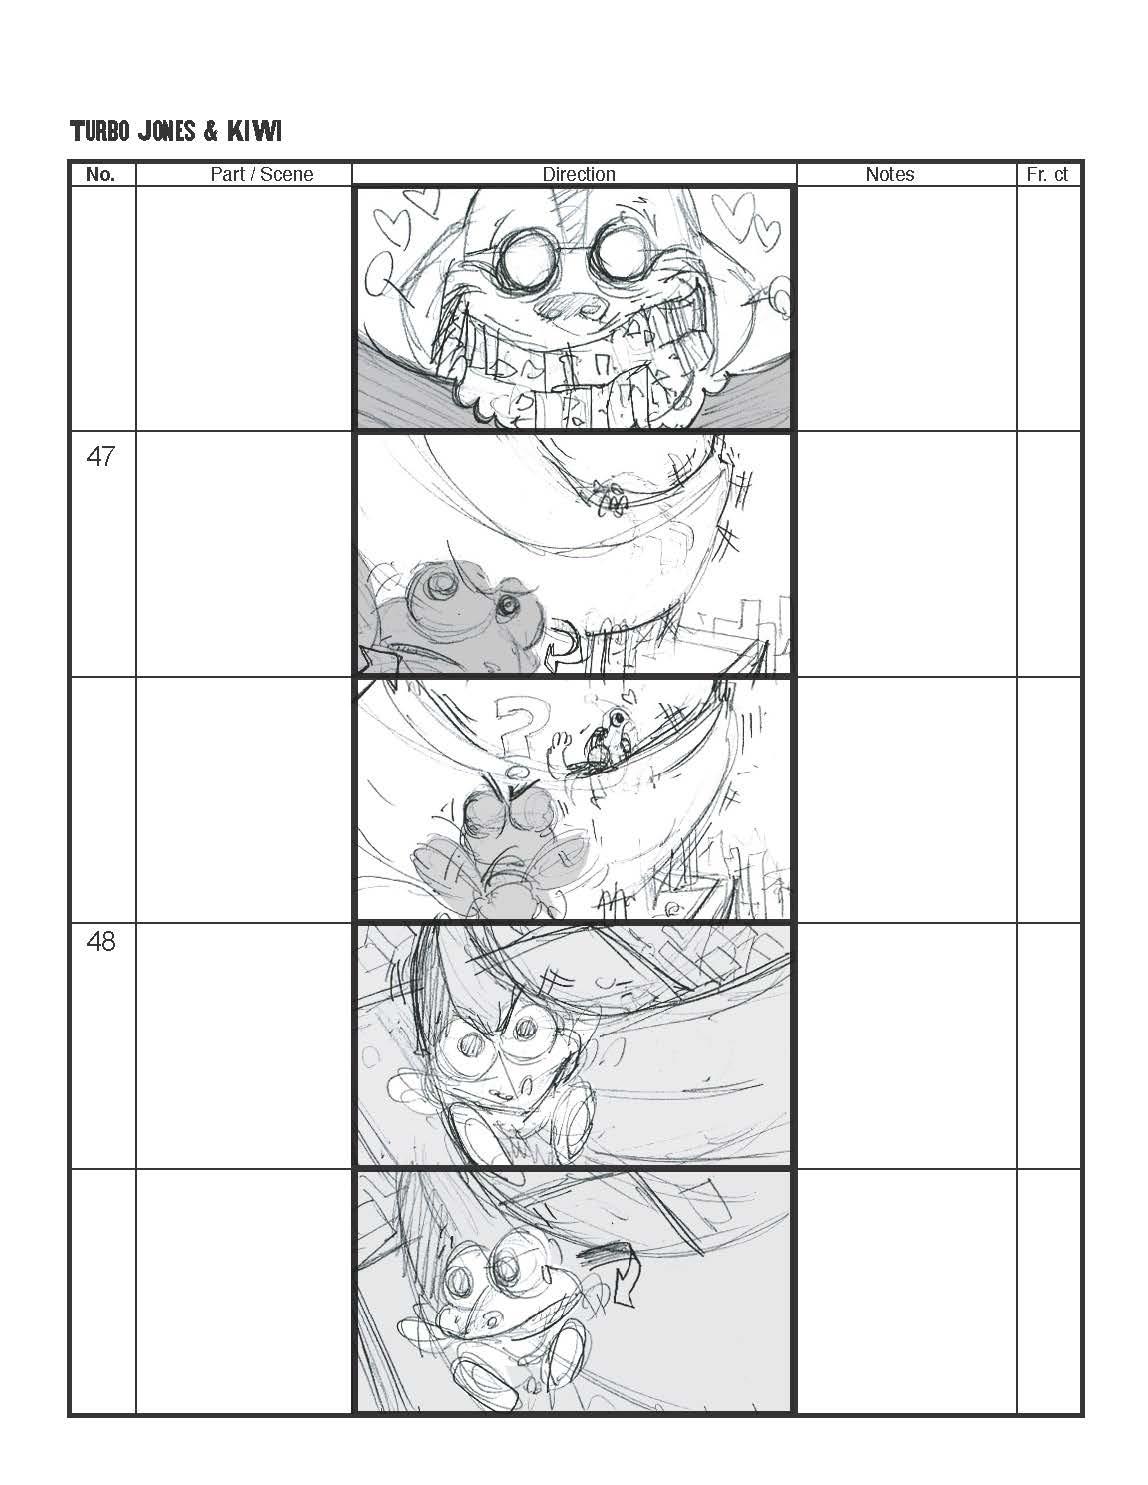 TJK_Storyboards_v01_HIGH_Page_25.jpg